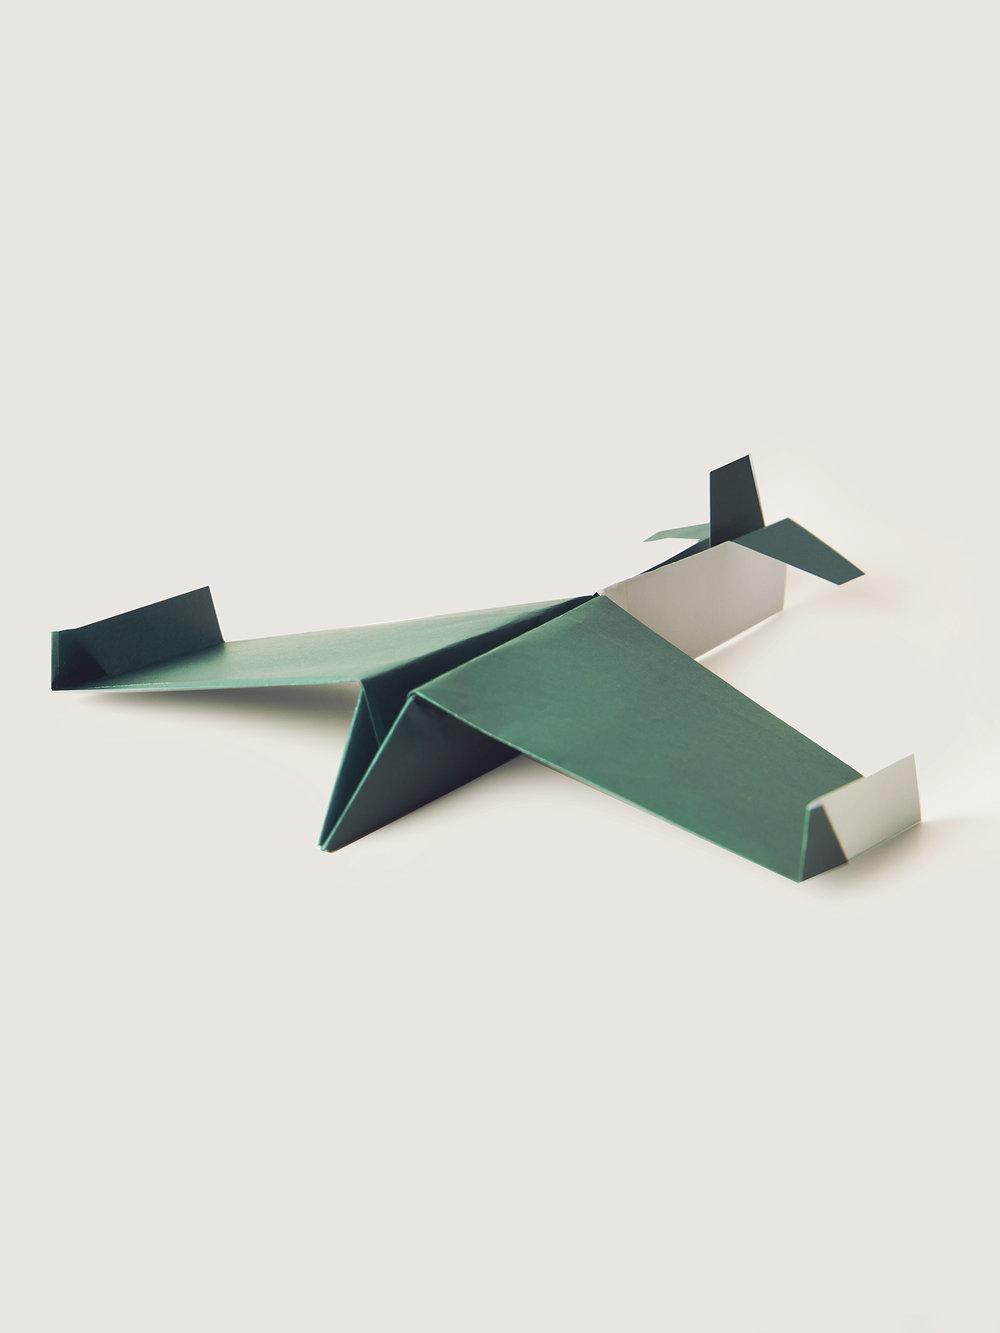 Origami Figur Papierflieger  Origami figure Paper airplane